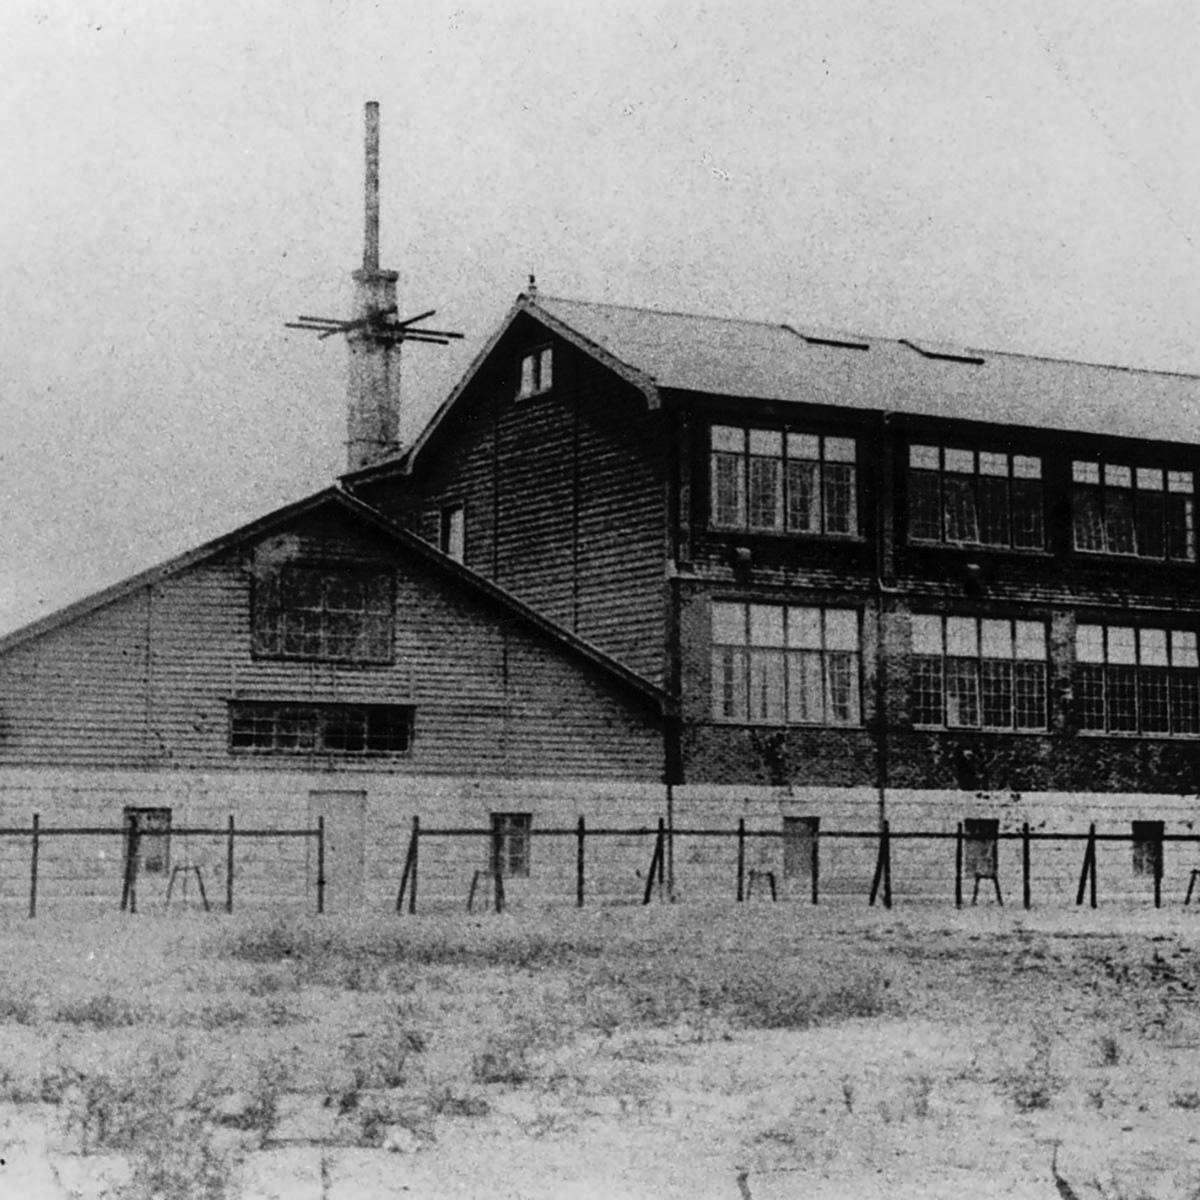 ASIJ Shibaura Campus from 1921